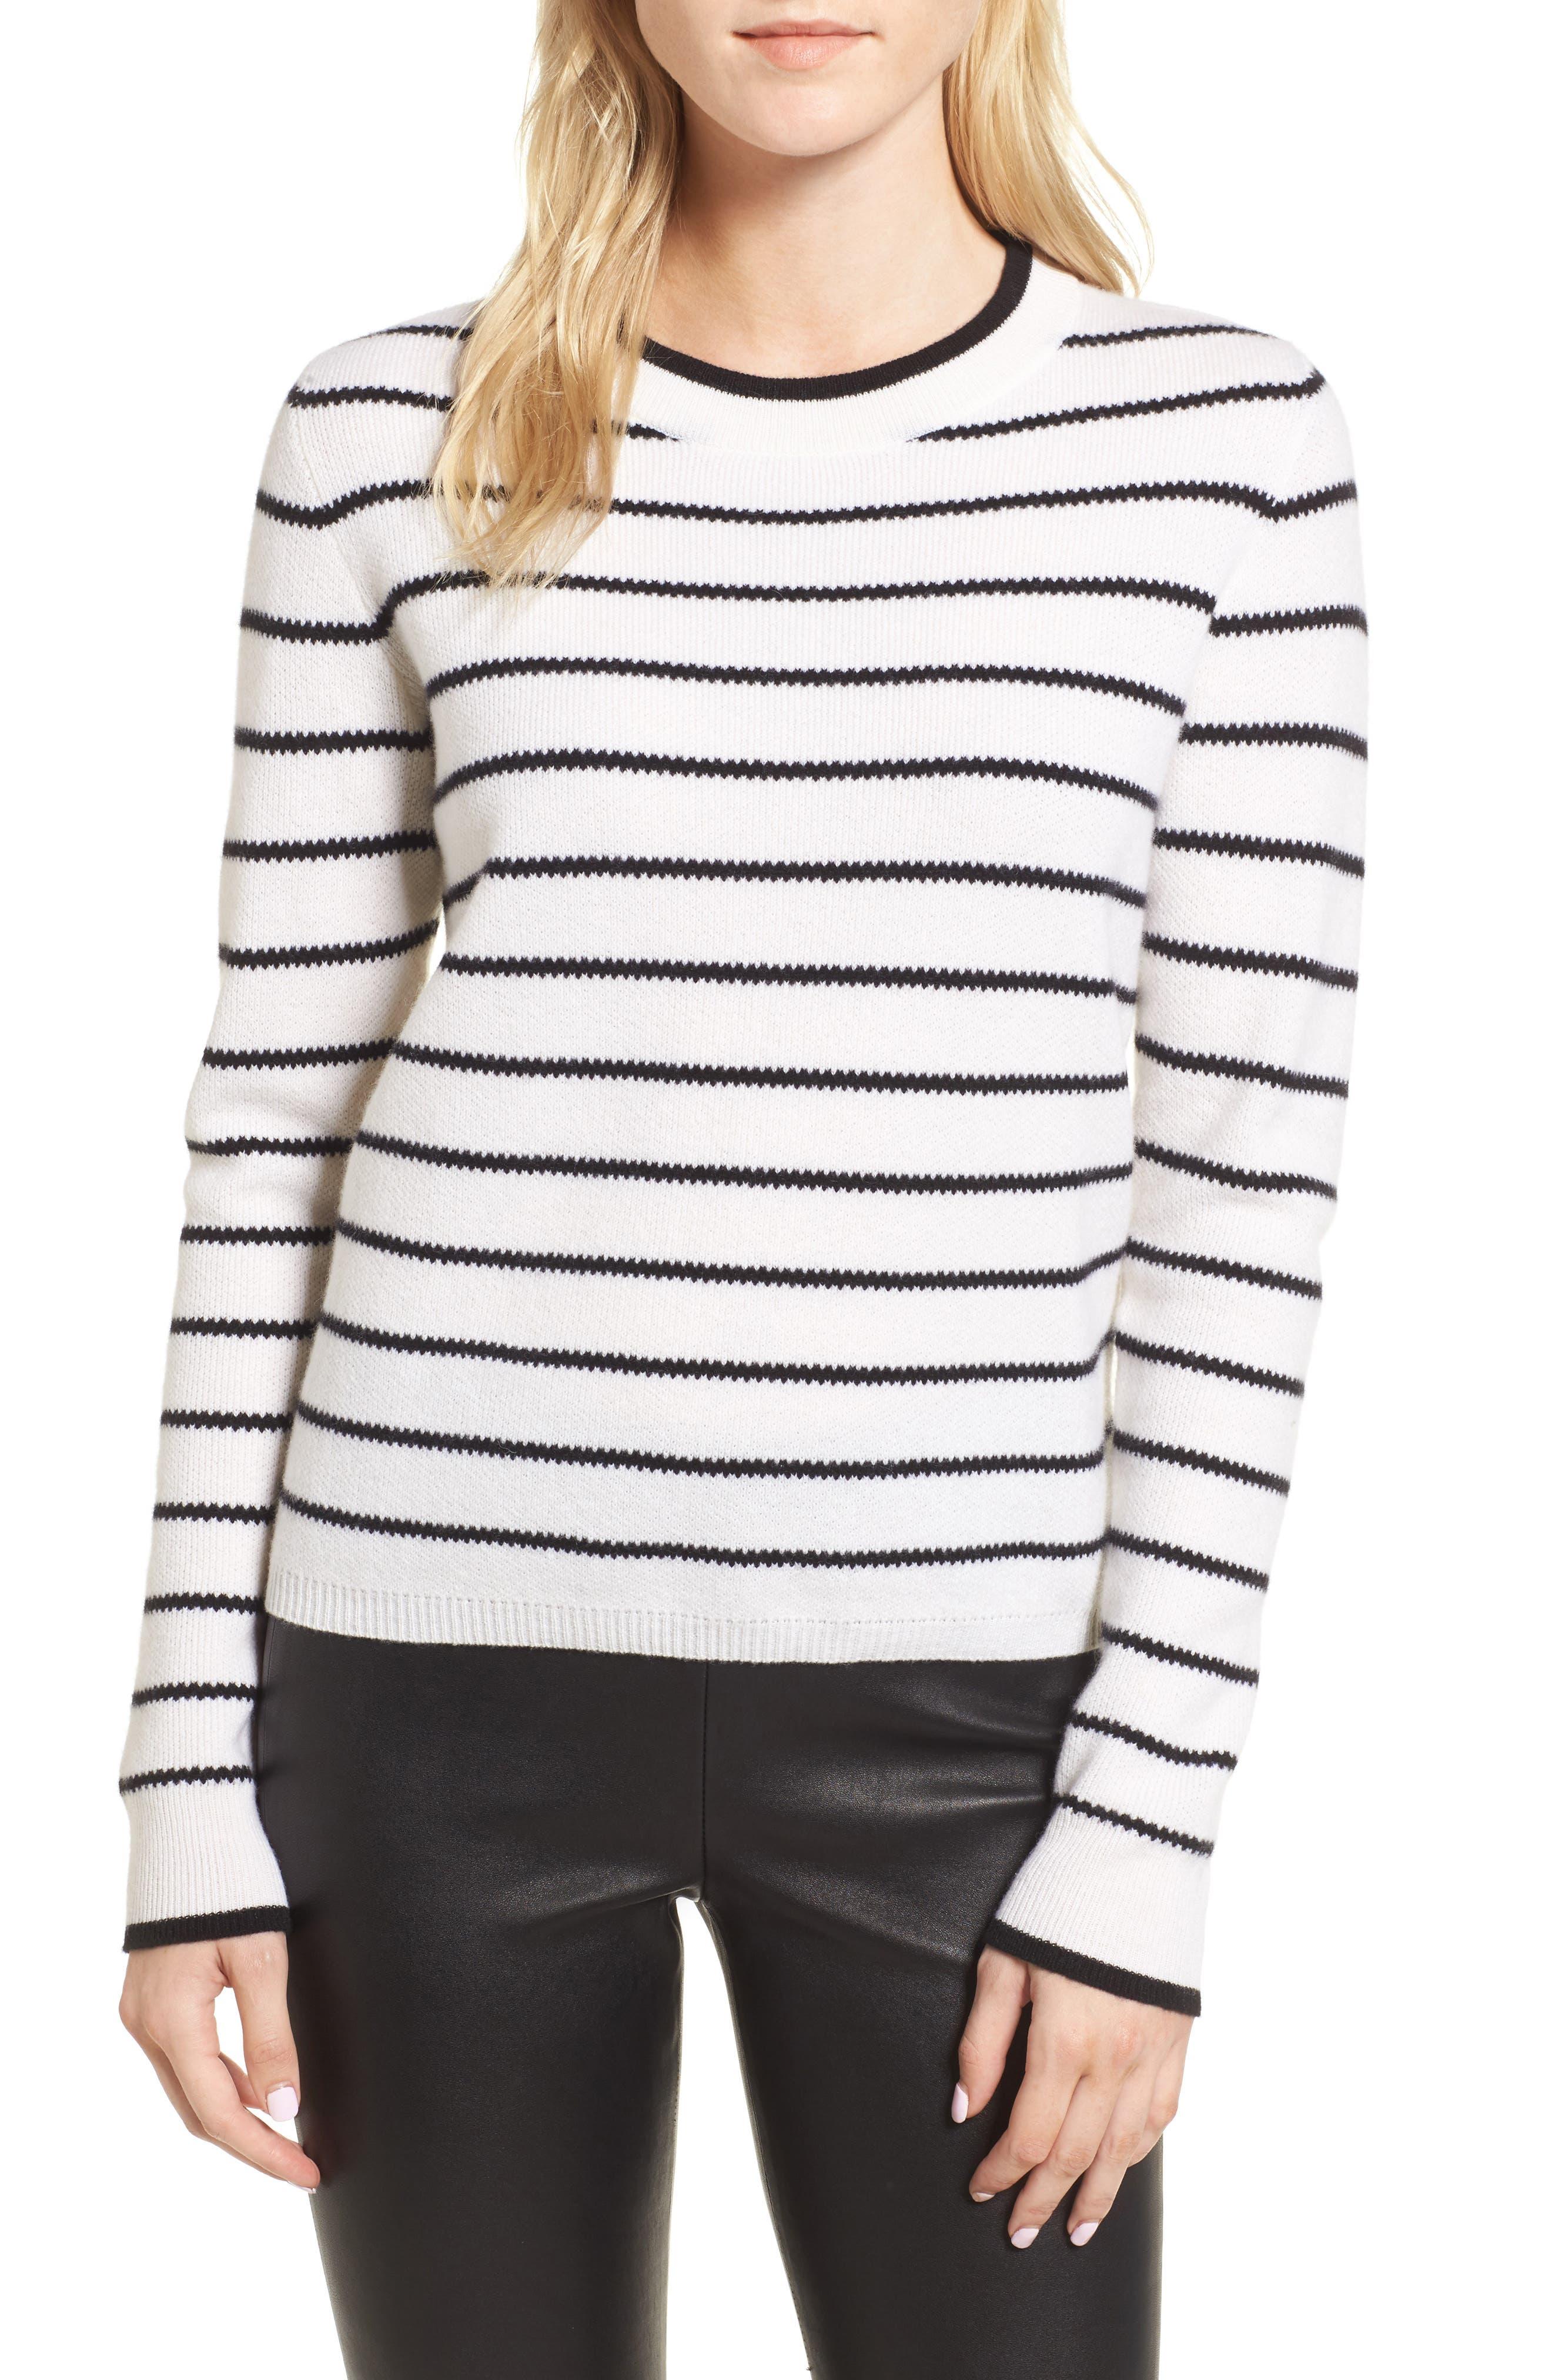 Nordstrom Signature Stripe Cashmere Sweater